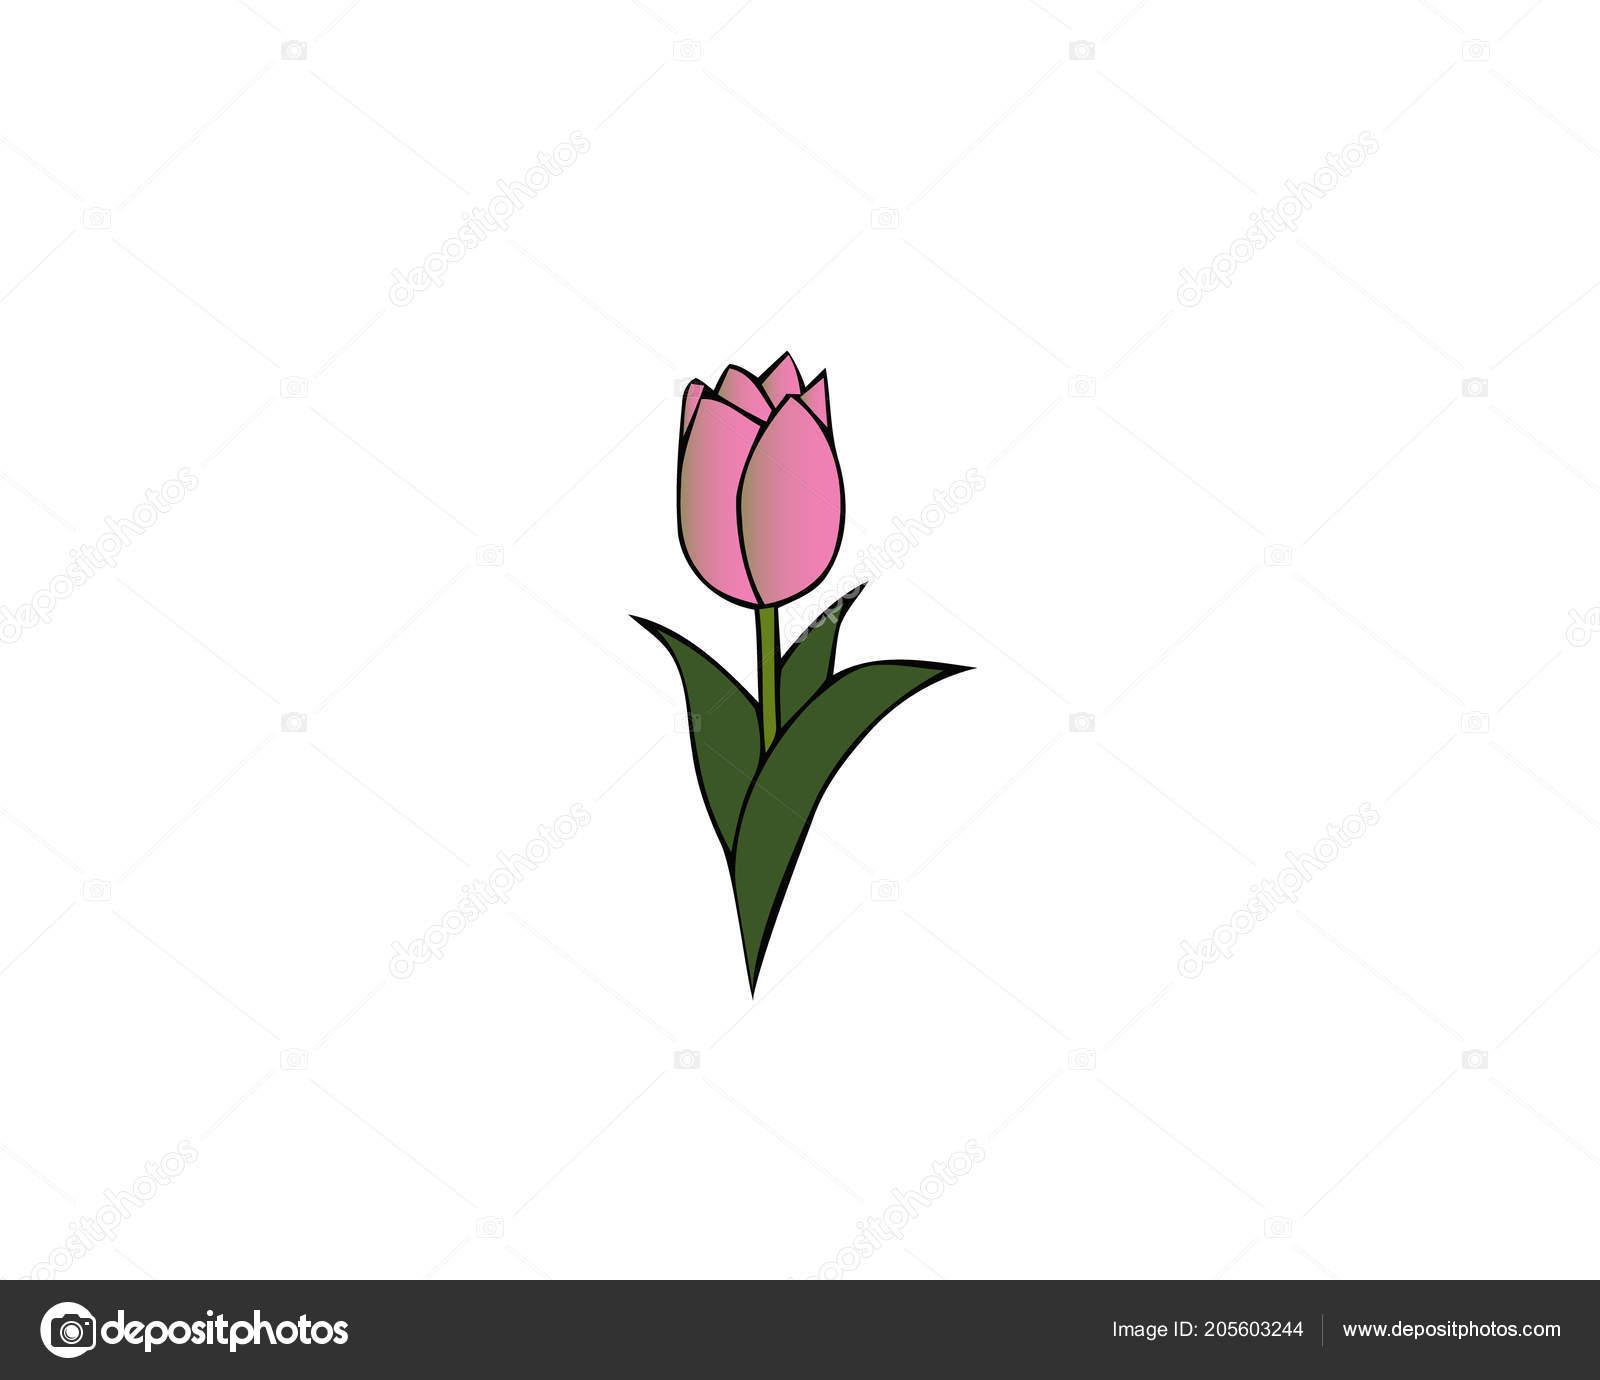 Unduh 400 Background Vector Bunga Tulip HD Terbaik